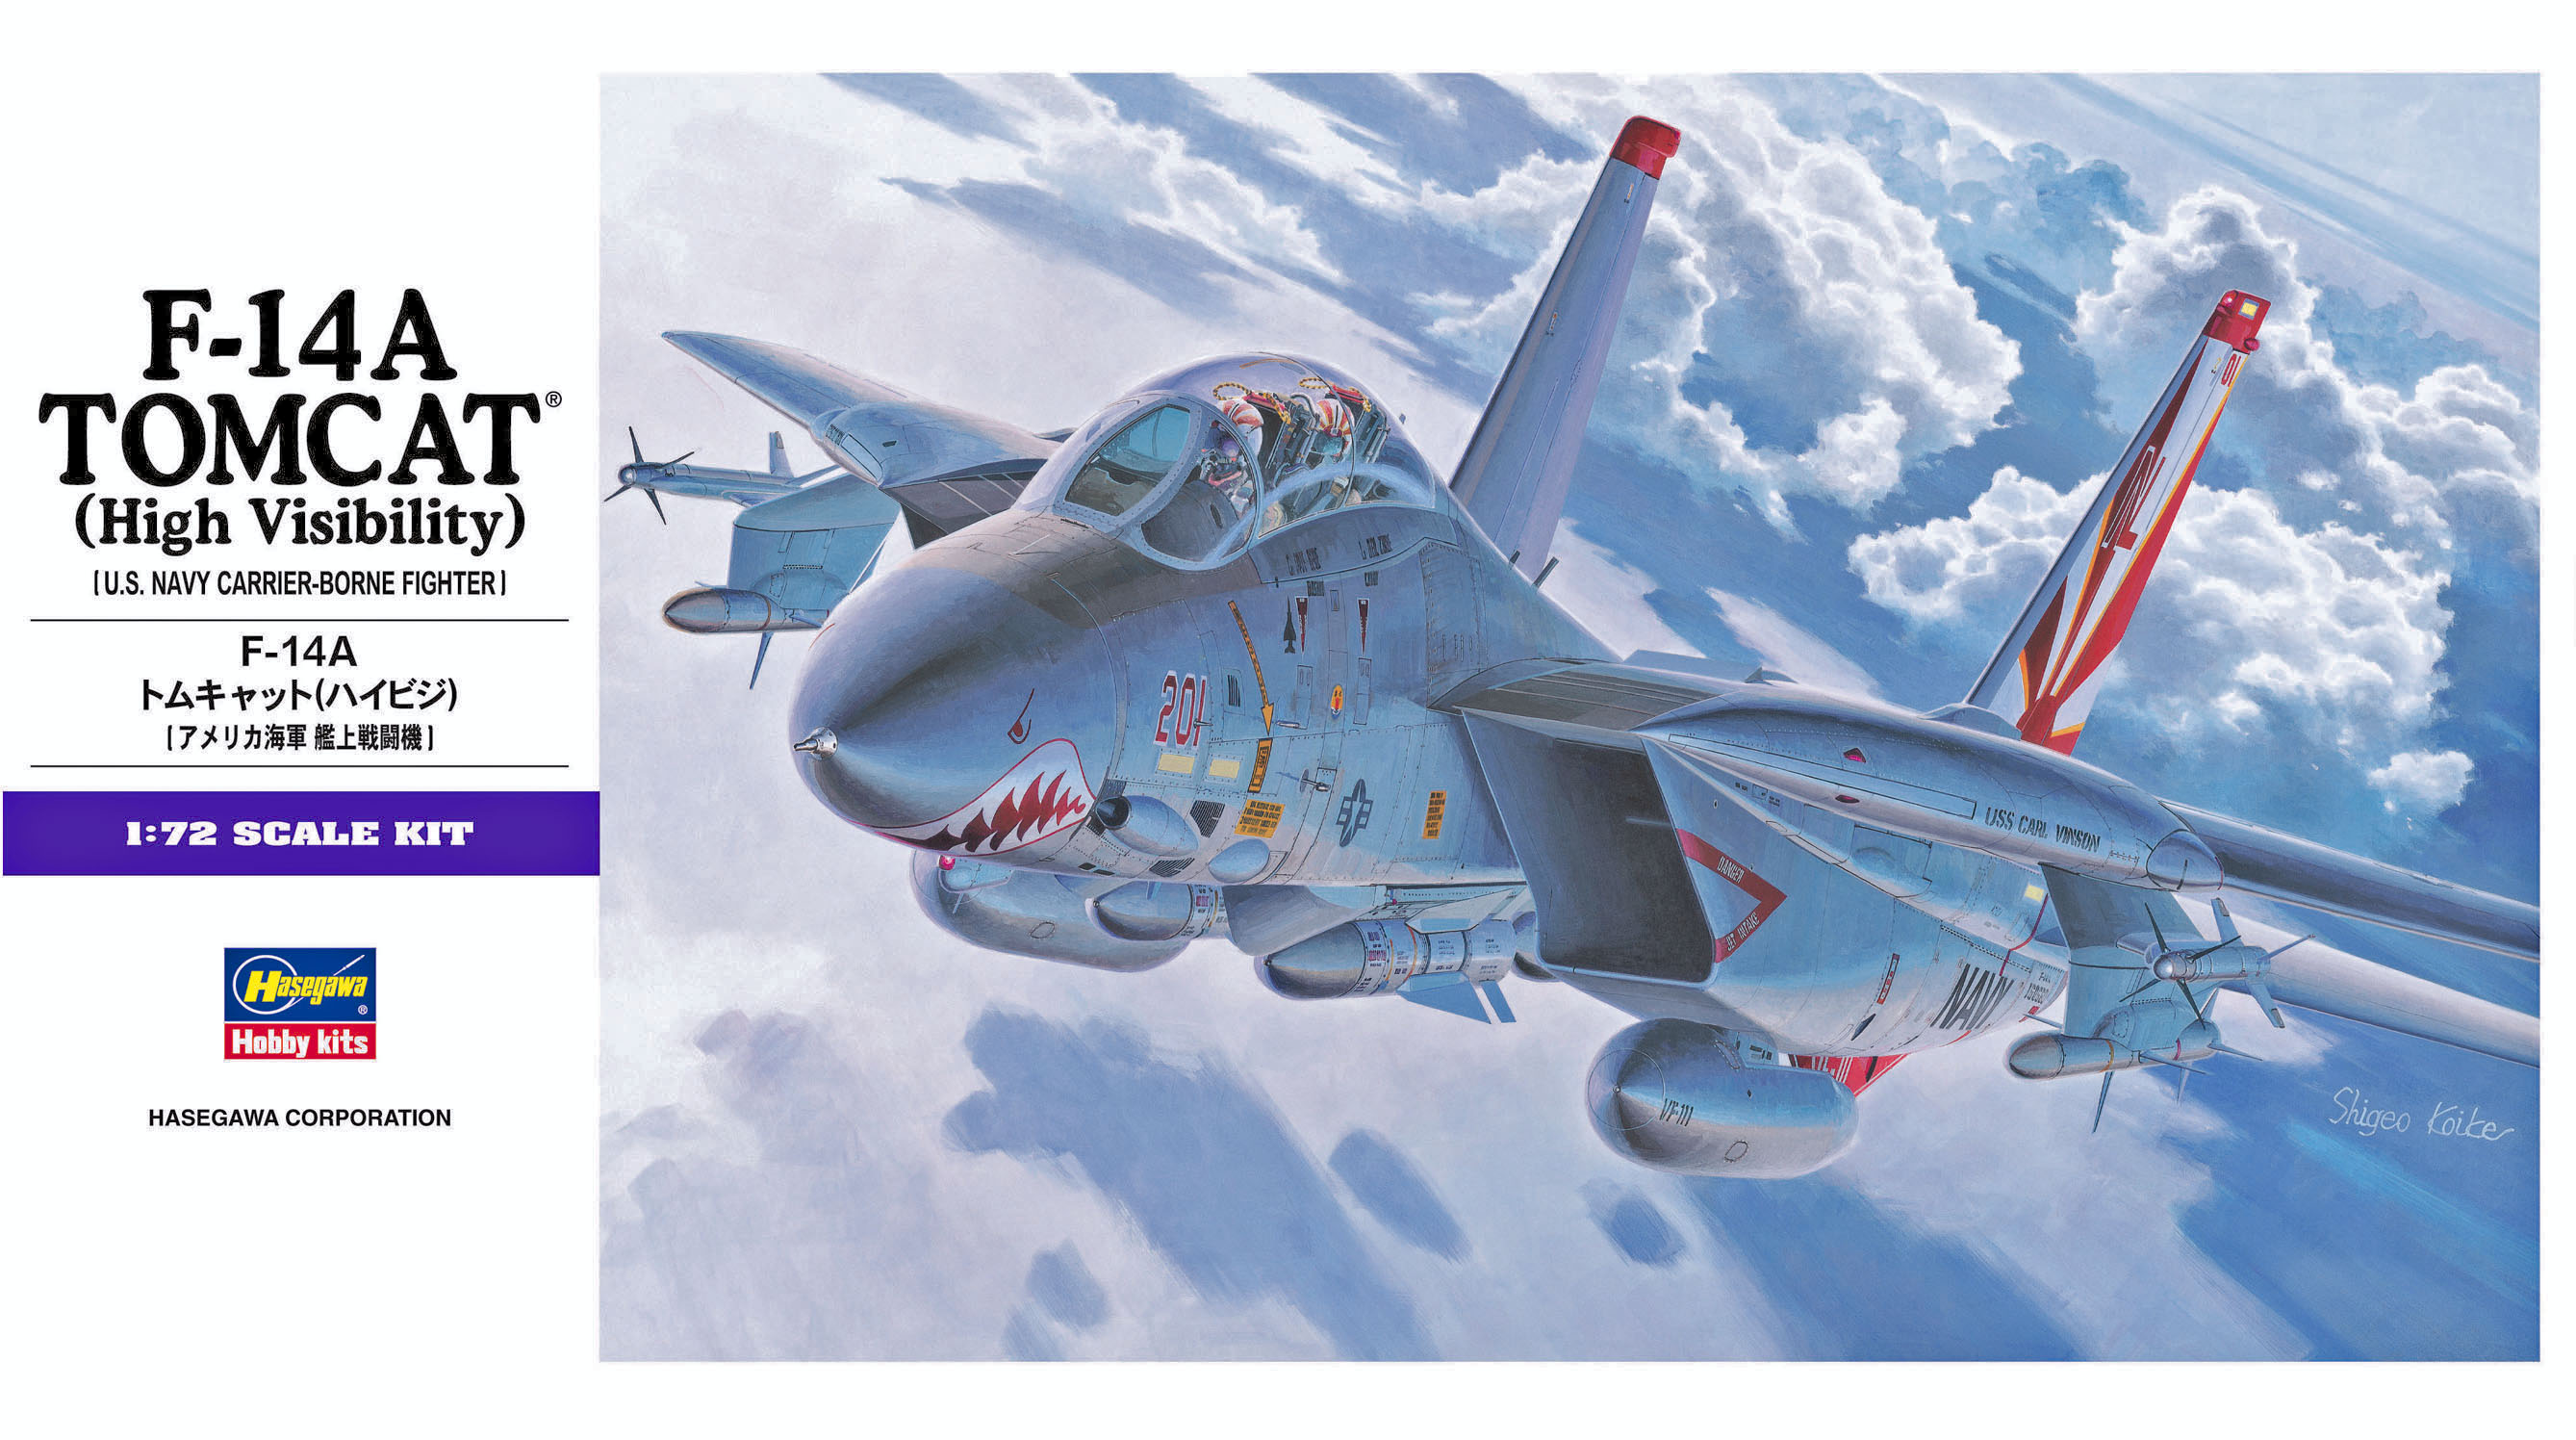 Hasegawa 1/72 F-14A Tomcat (High Visibility)